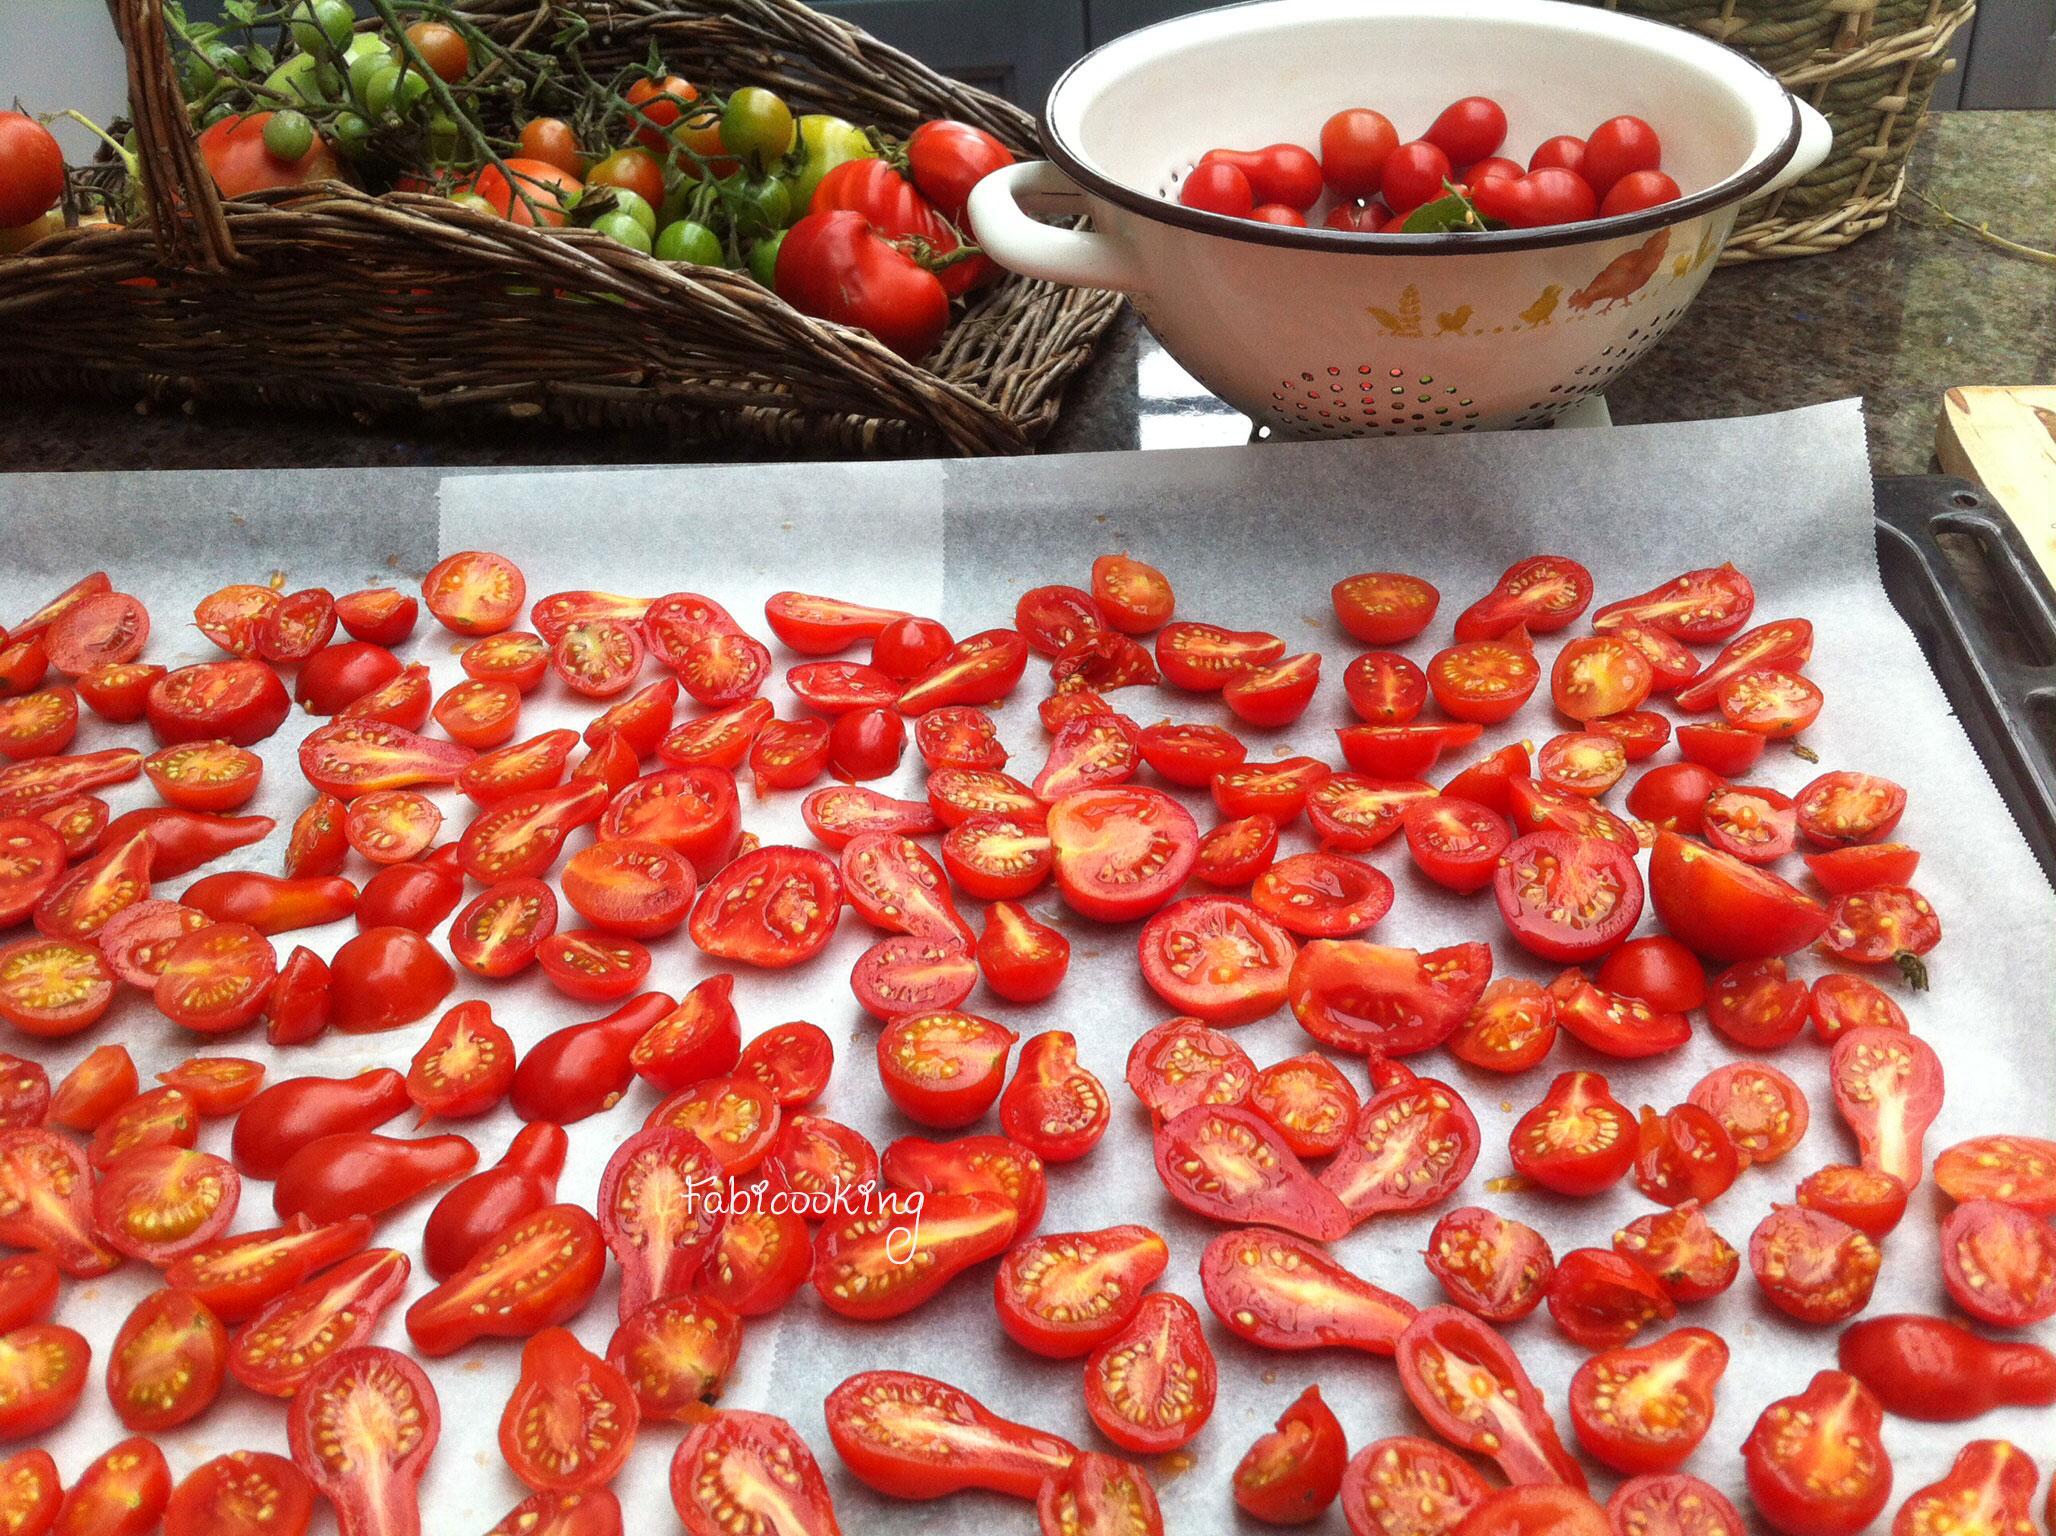 Tomates s ch es fabicooking - Quand repiquer les tomates ...